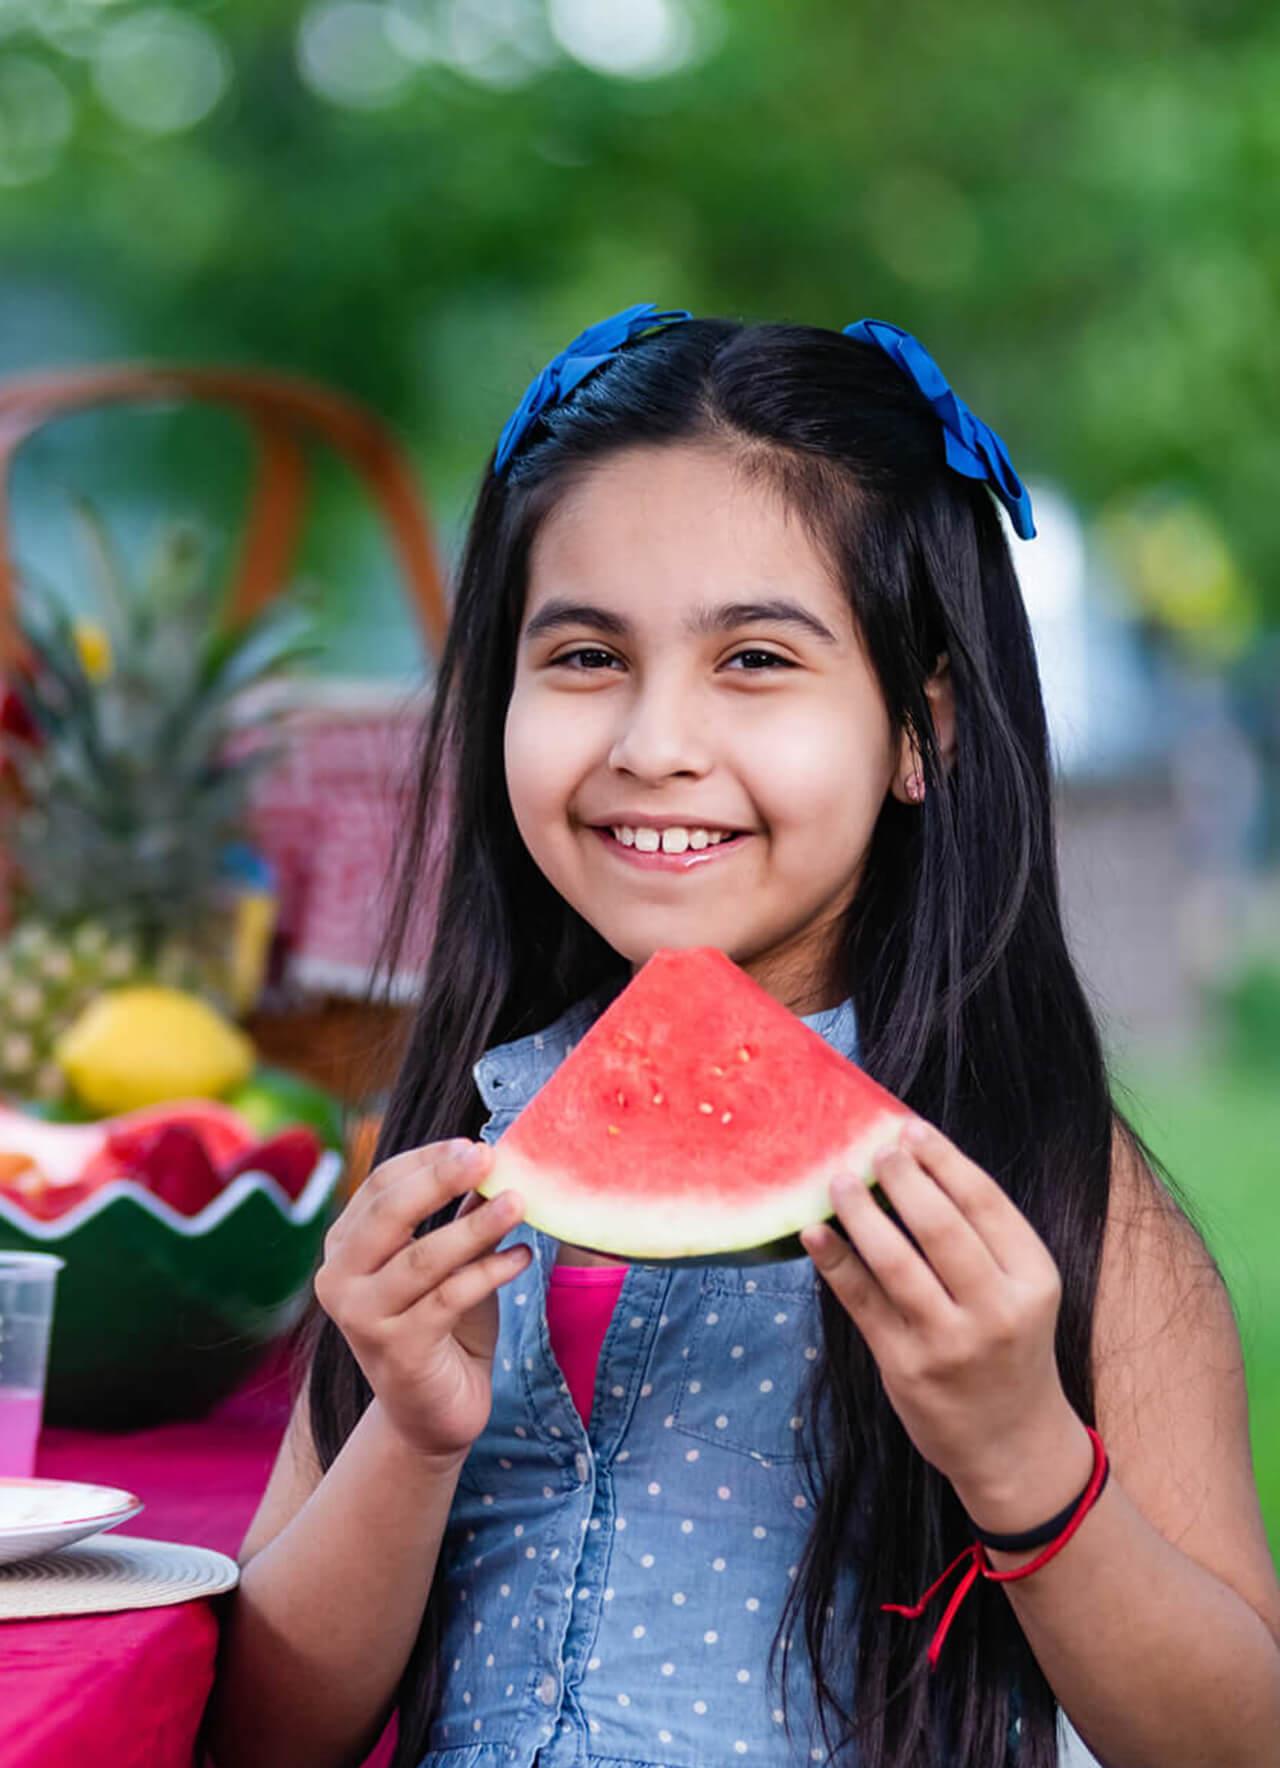 About Girl enjoying Kids Choice Watermelon slice